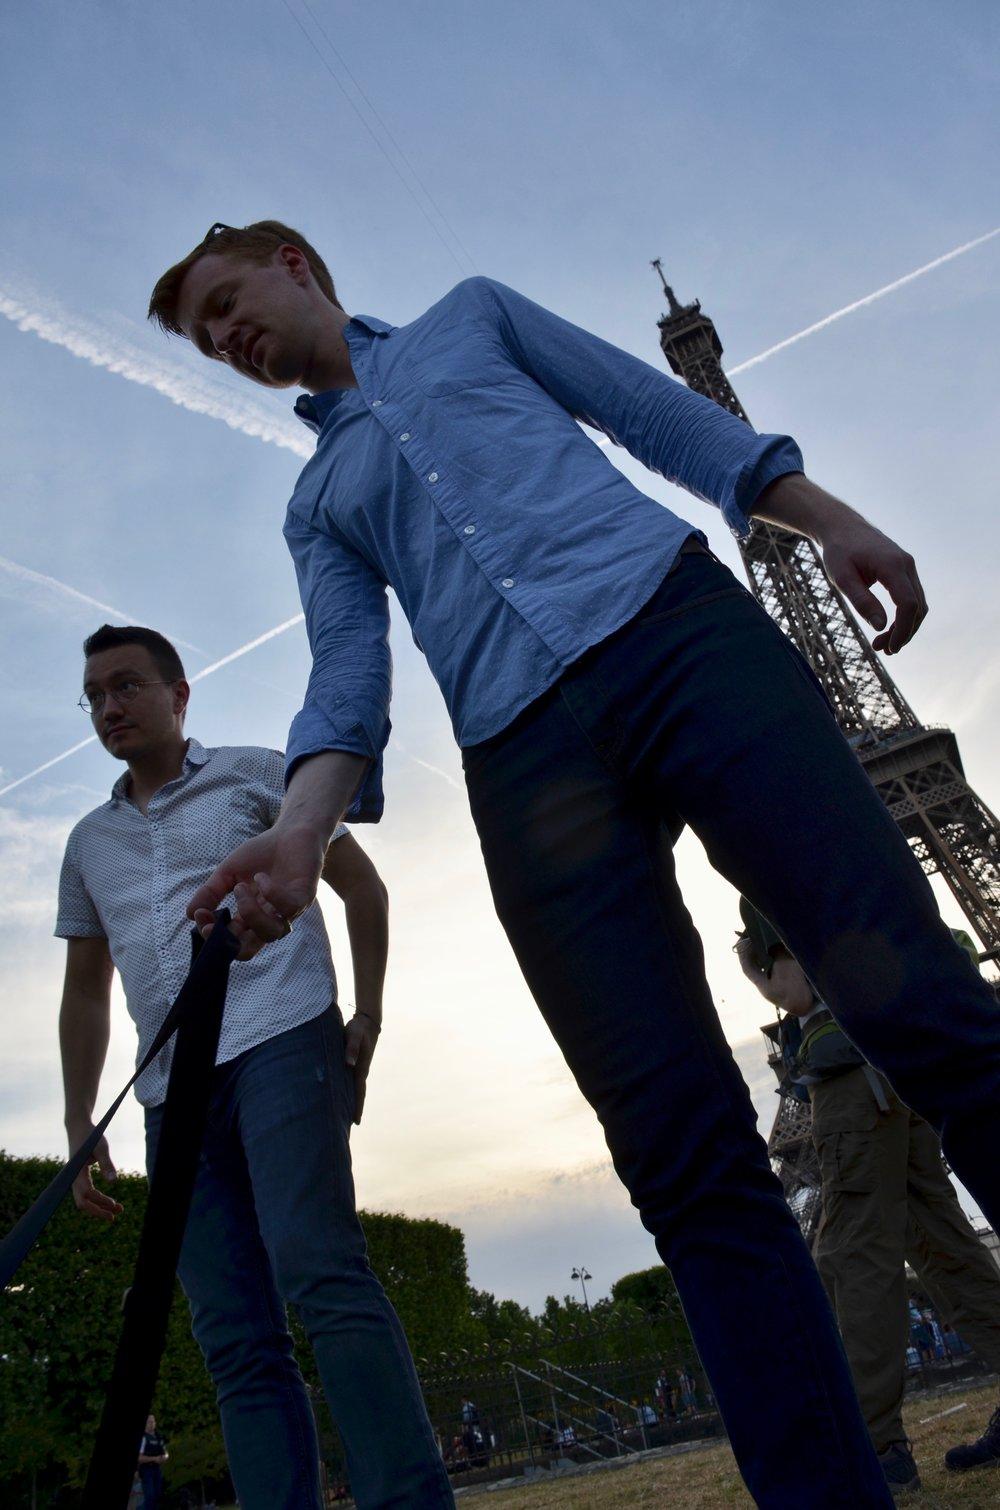 Corey de Tar and Jon Ortloff enjoying the Eiffel Tower